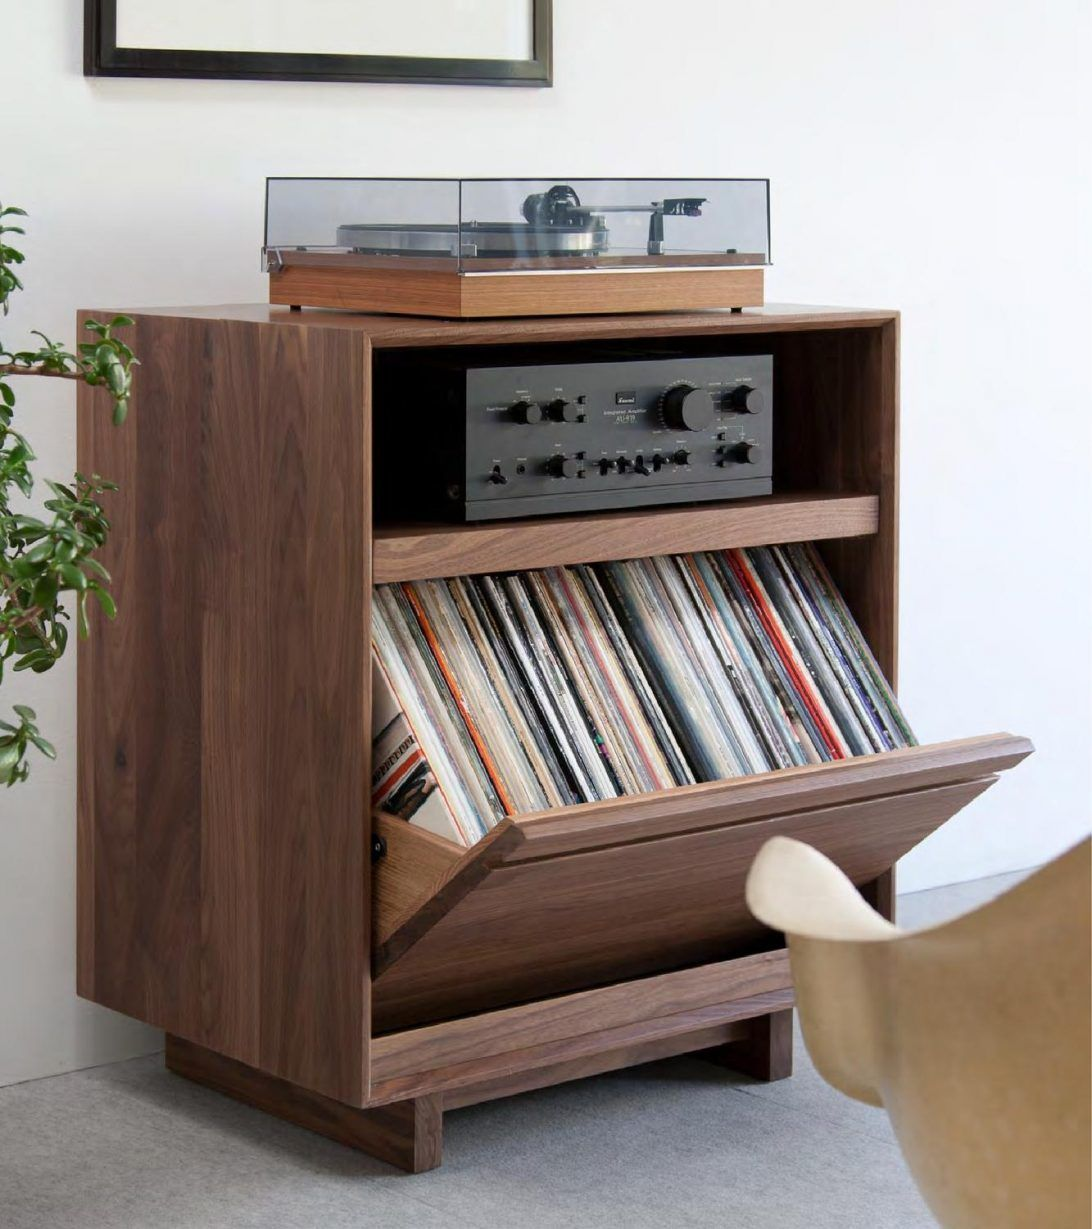 Diy dvd storage ideas for small spaces diy ideas